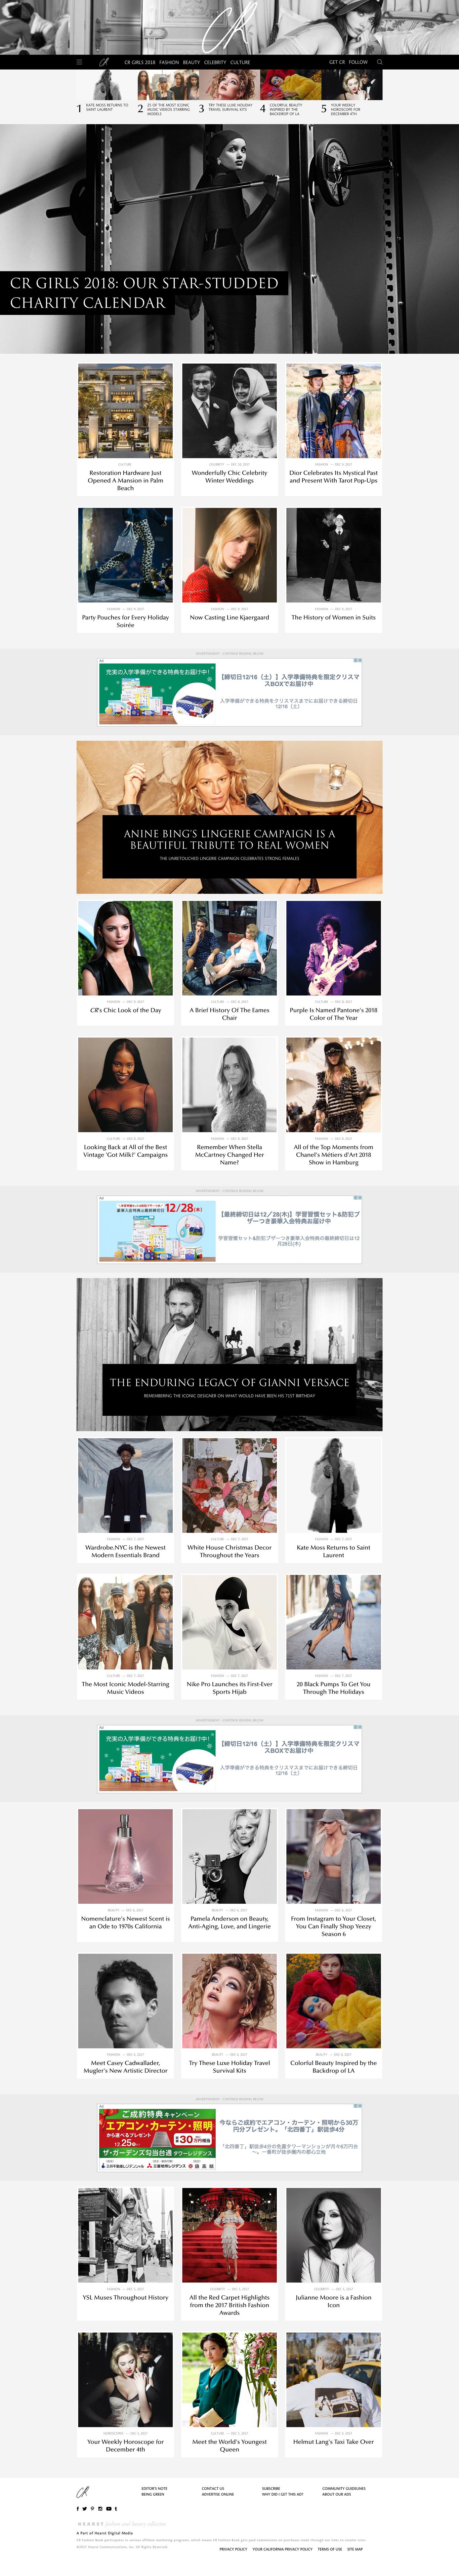 CR Fashion Book by Carine Roitfeld • Adoreness